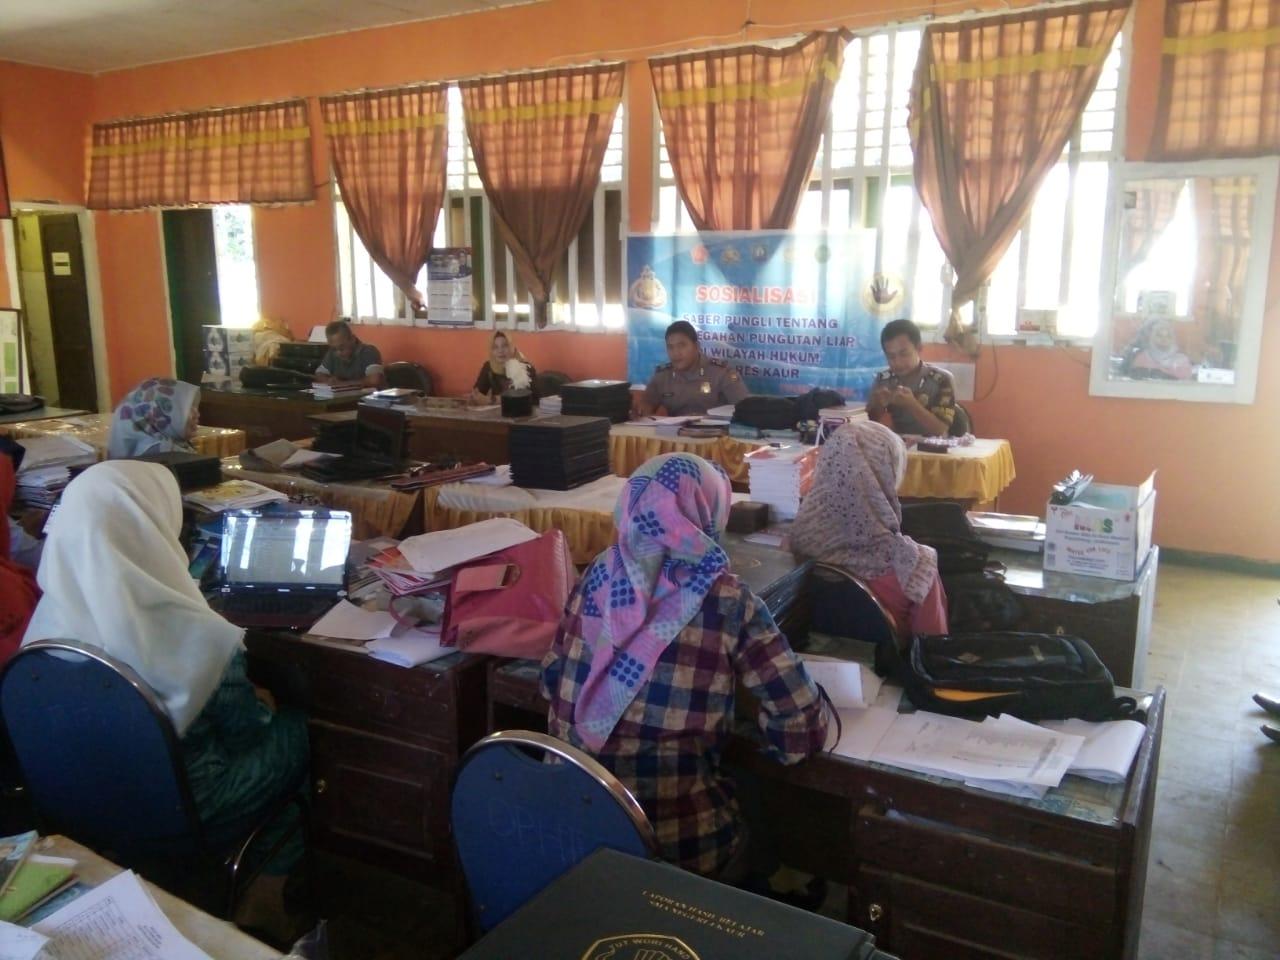 Cegah Pungli Disekolah, Polsek Kaur Utara Gelar Sosialisasi